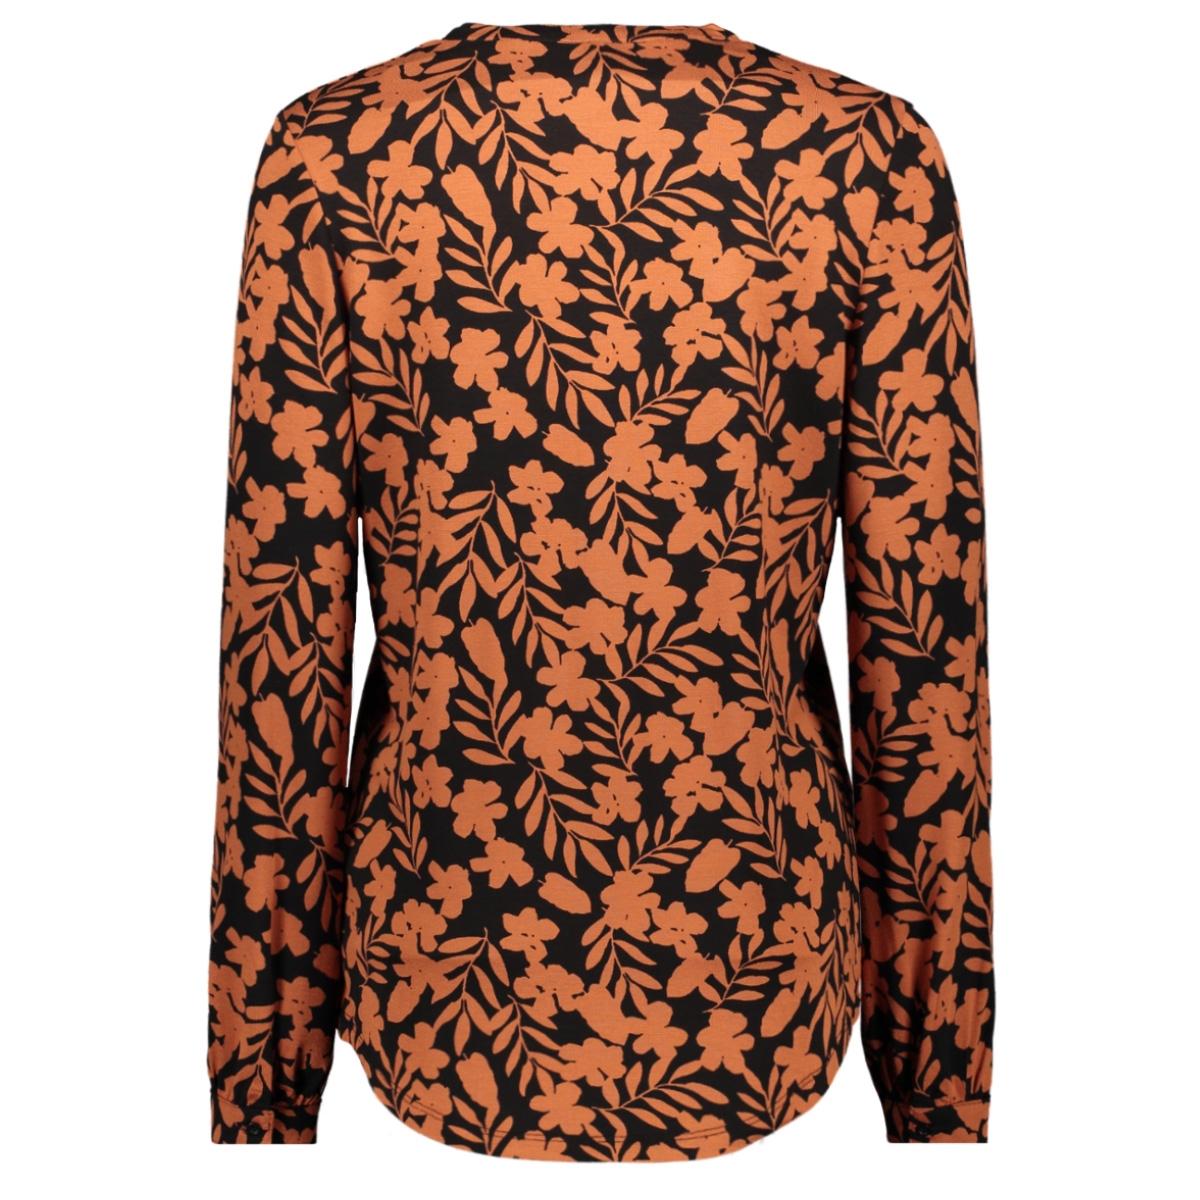 daze shirt with print 195 zoso blouse black/burnt orange